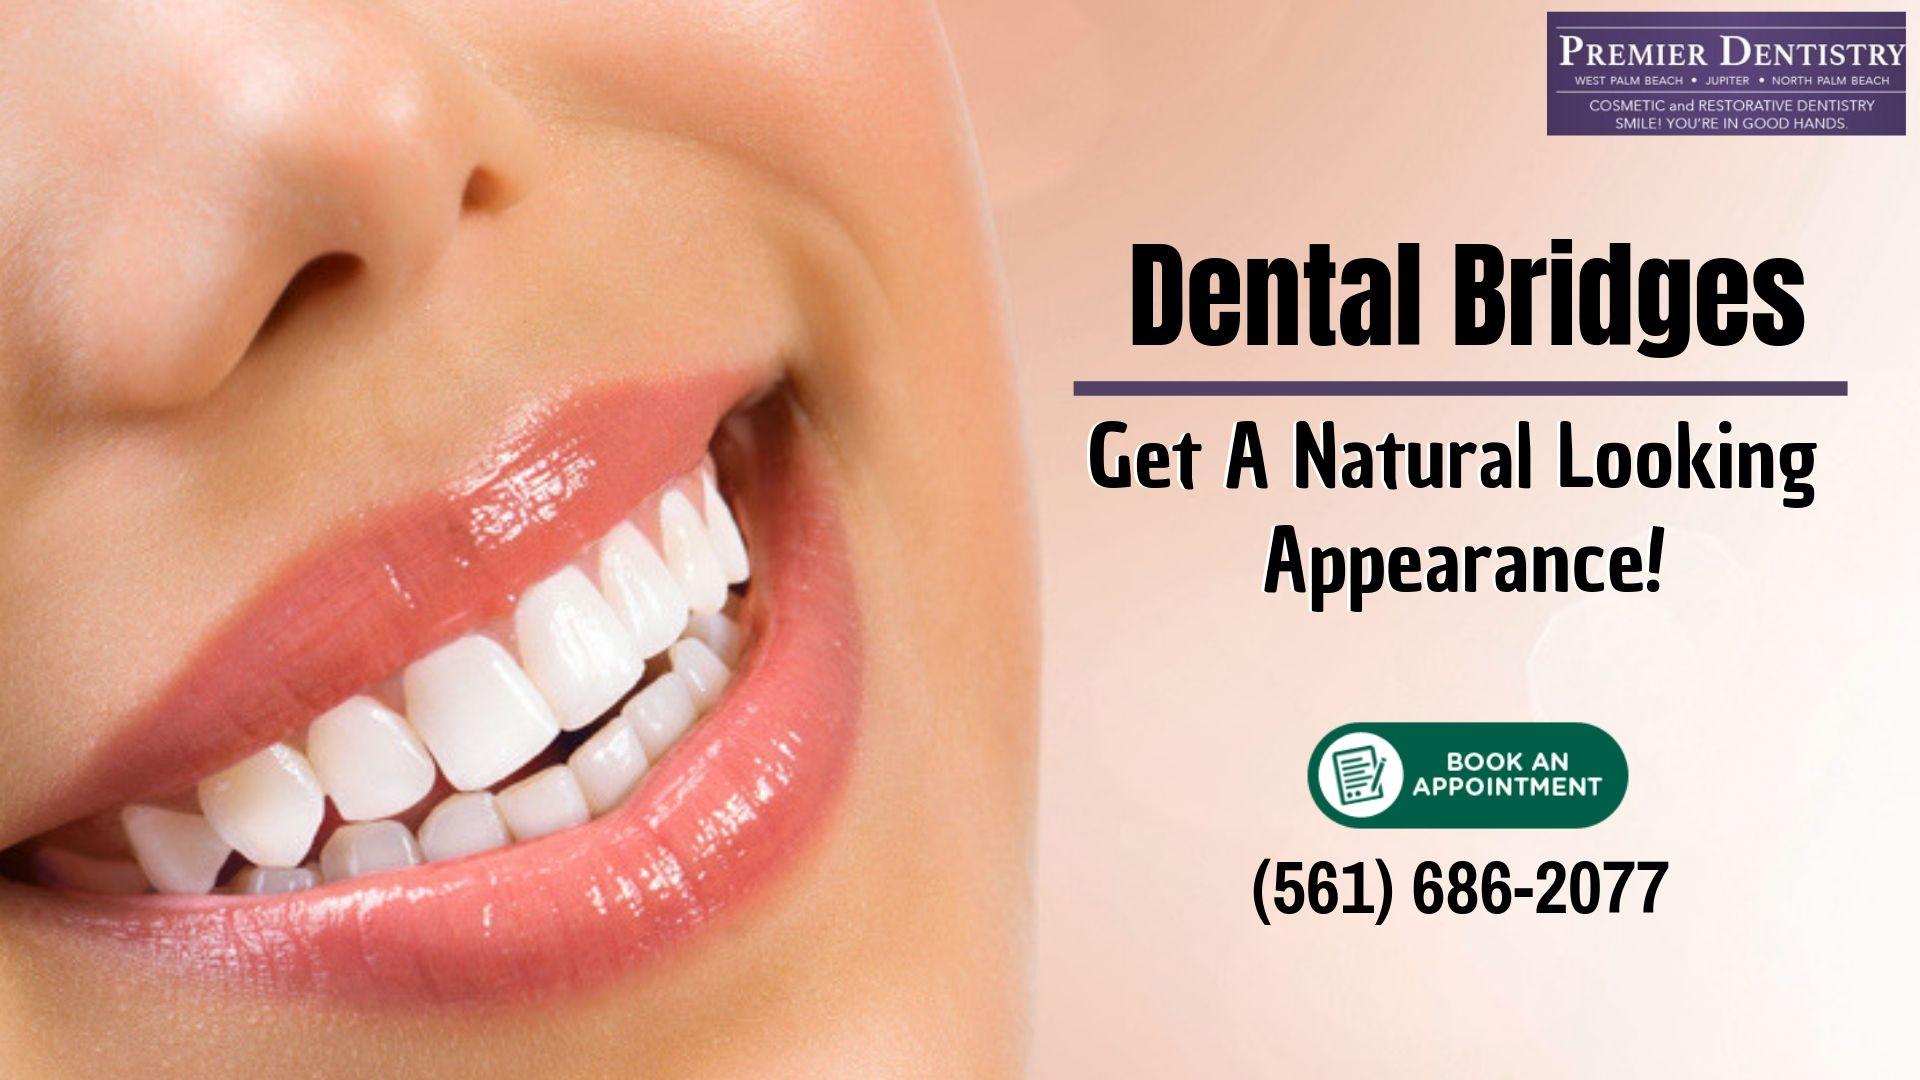 North Palm Beach Dental Care Dentistry, Dental bridge